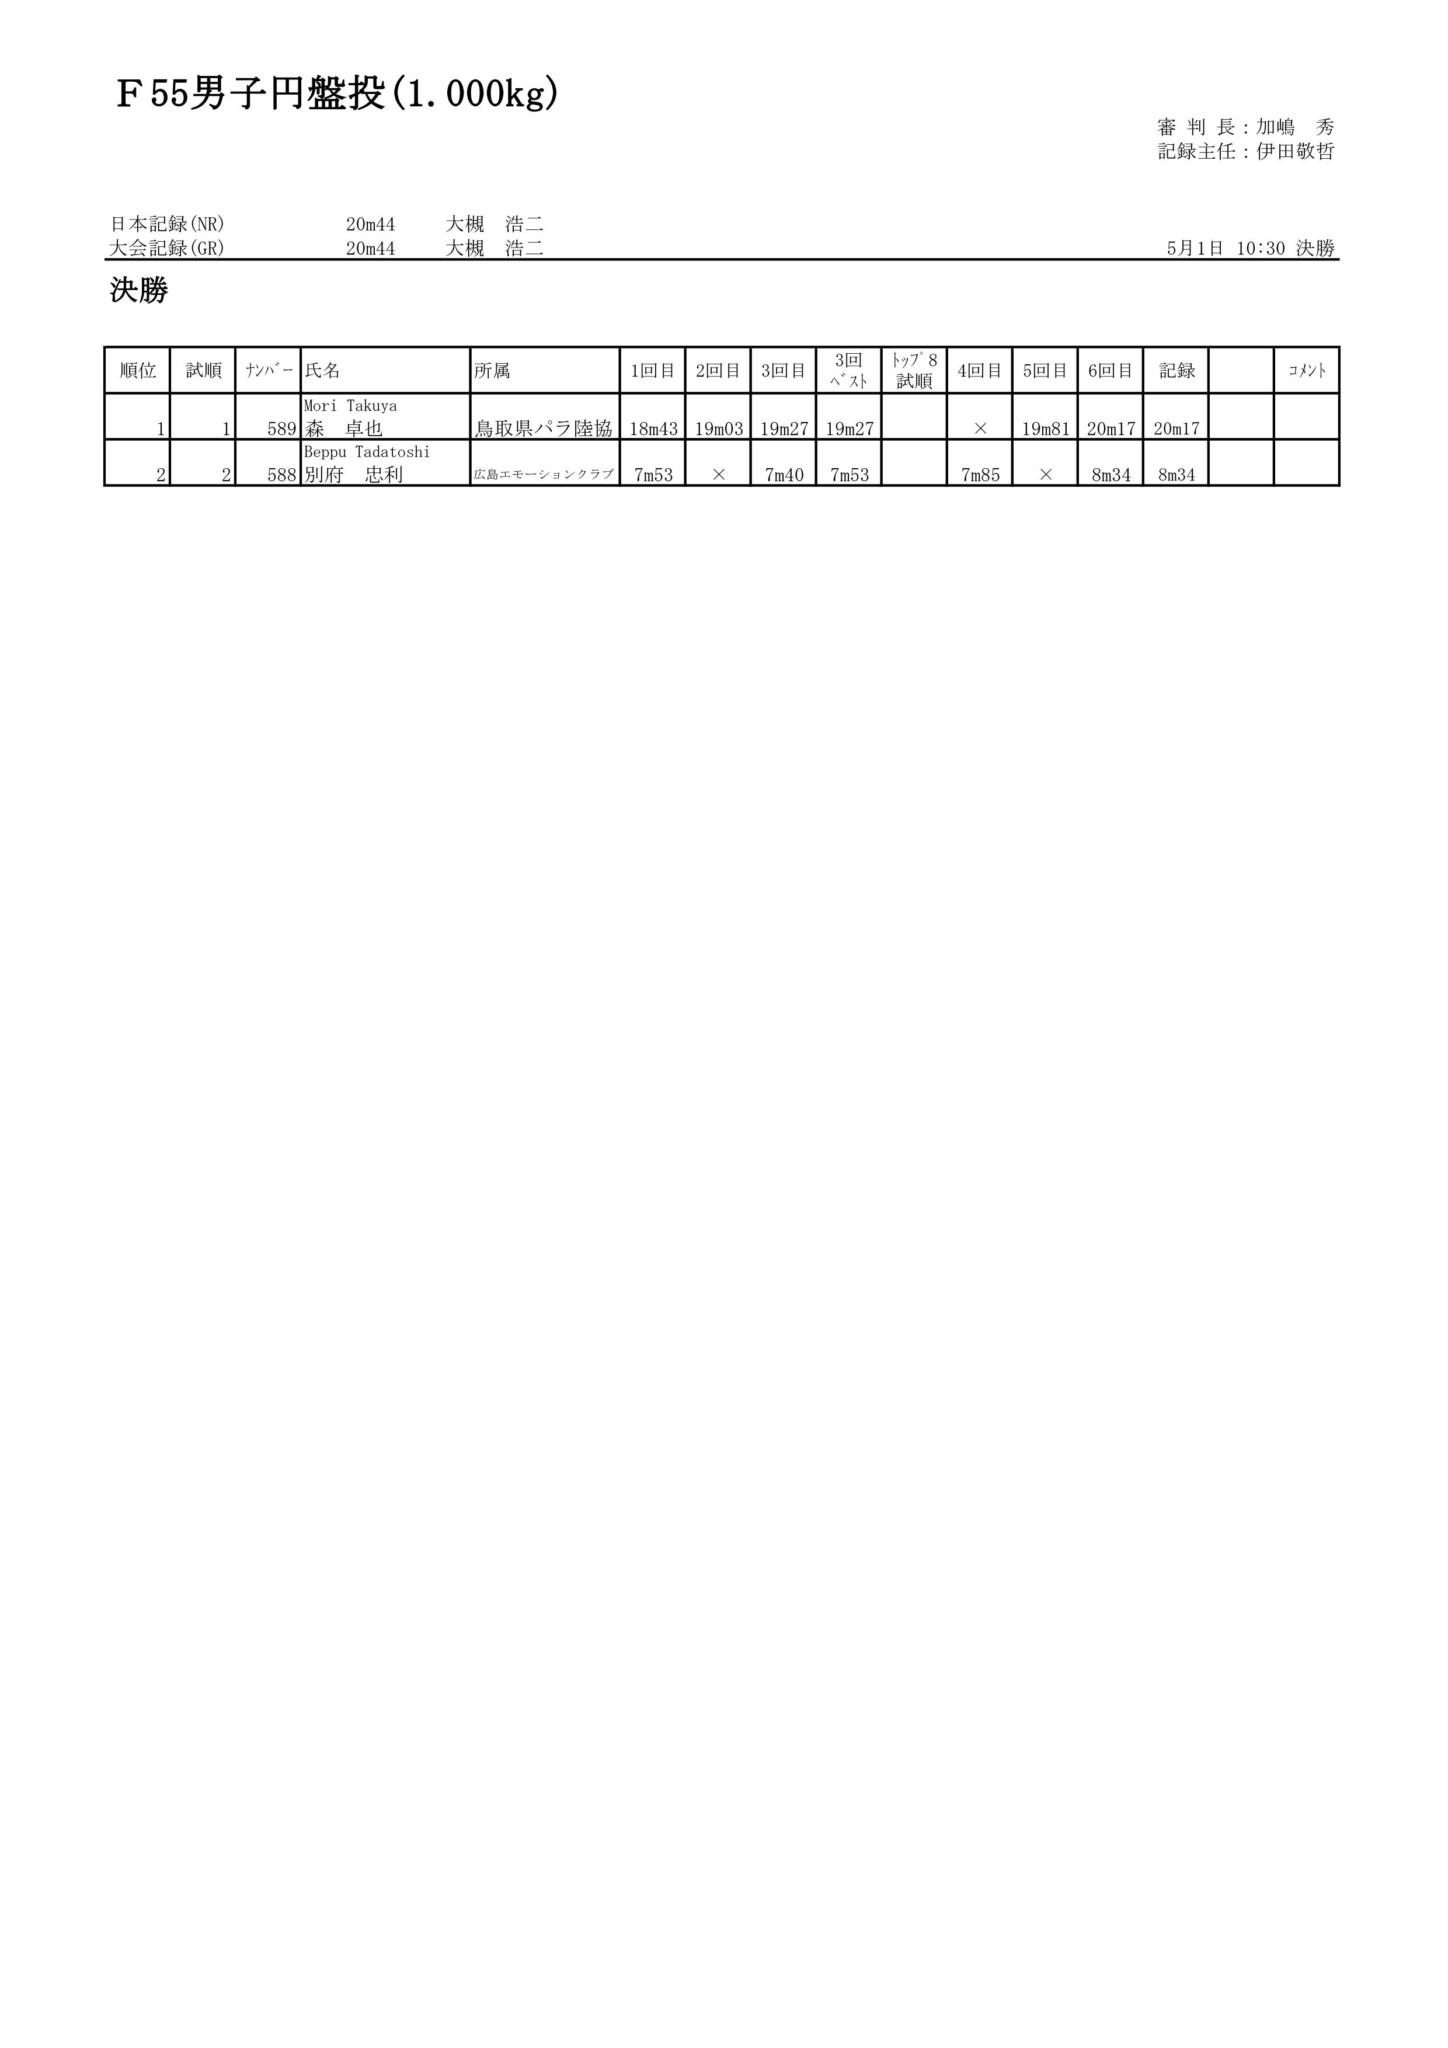 22F55男子円盤投(1.000kg)_01